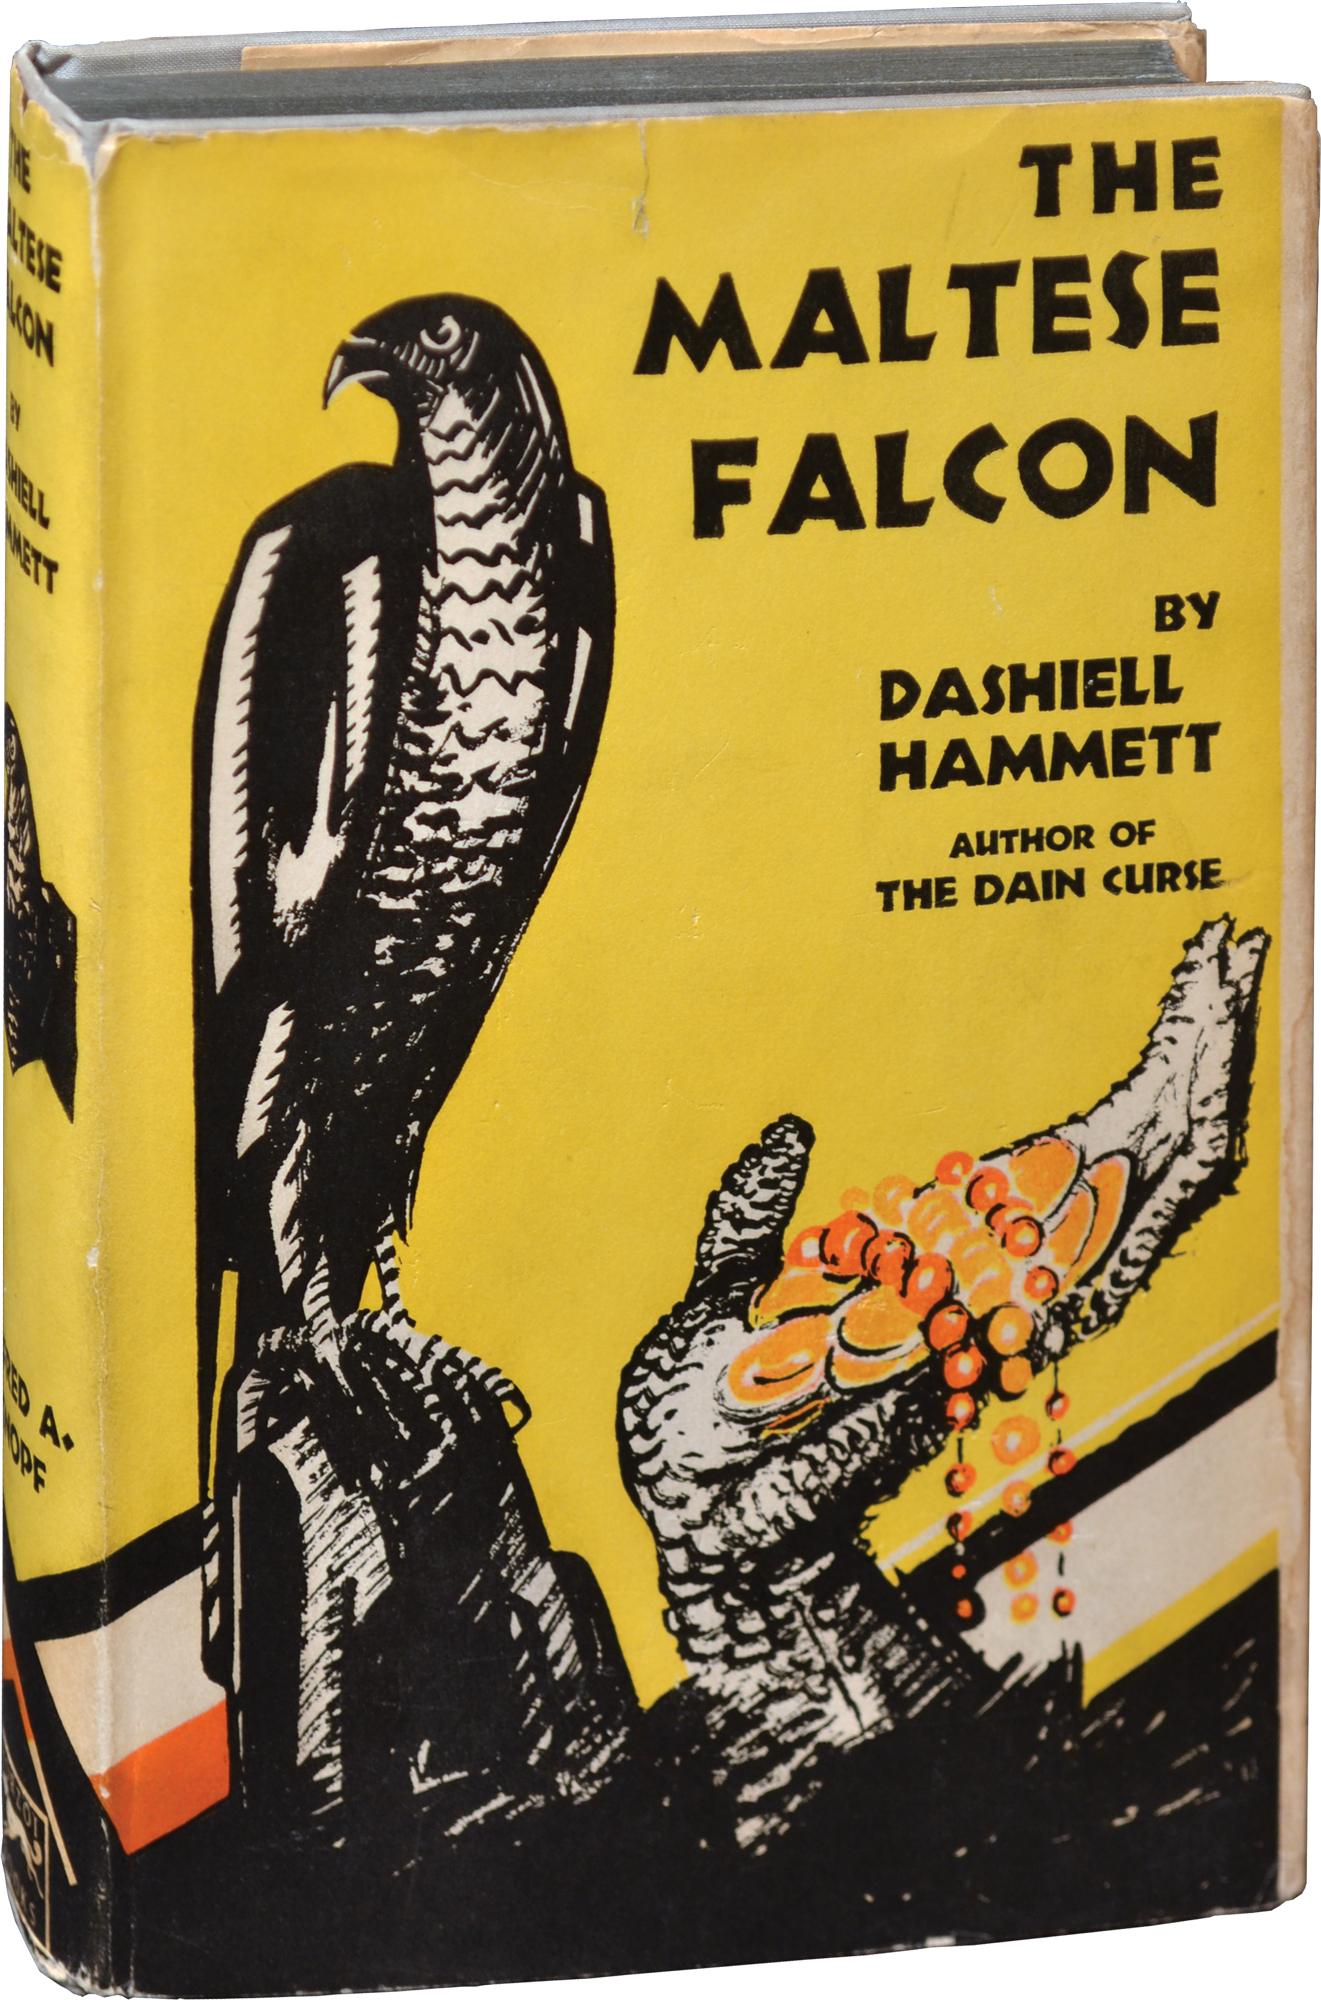 Hammett Maltese Falcon 1st Knopf 1930 Credit Royal Books